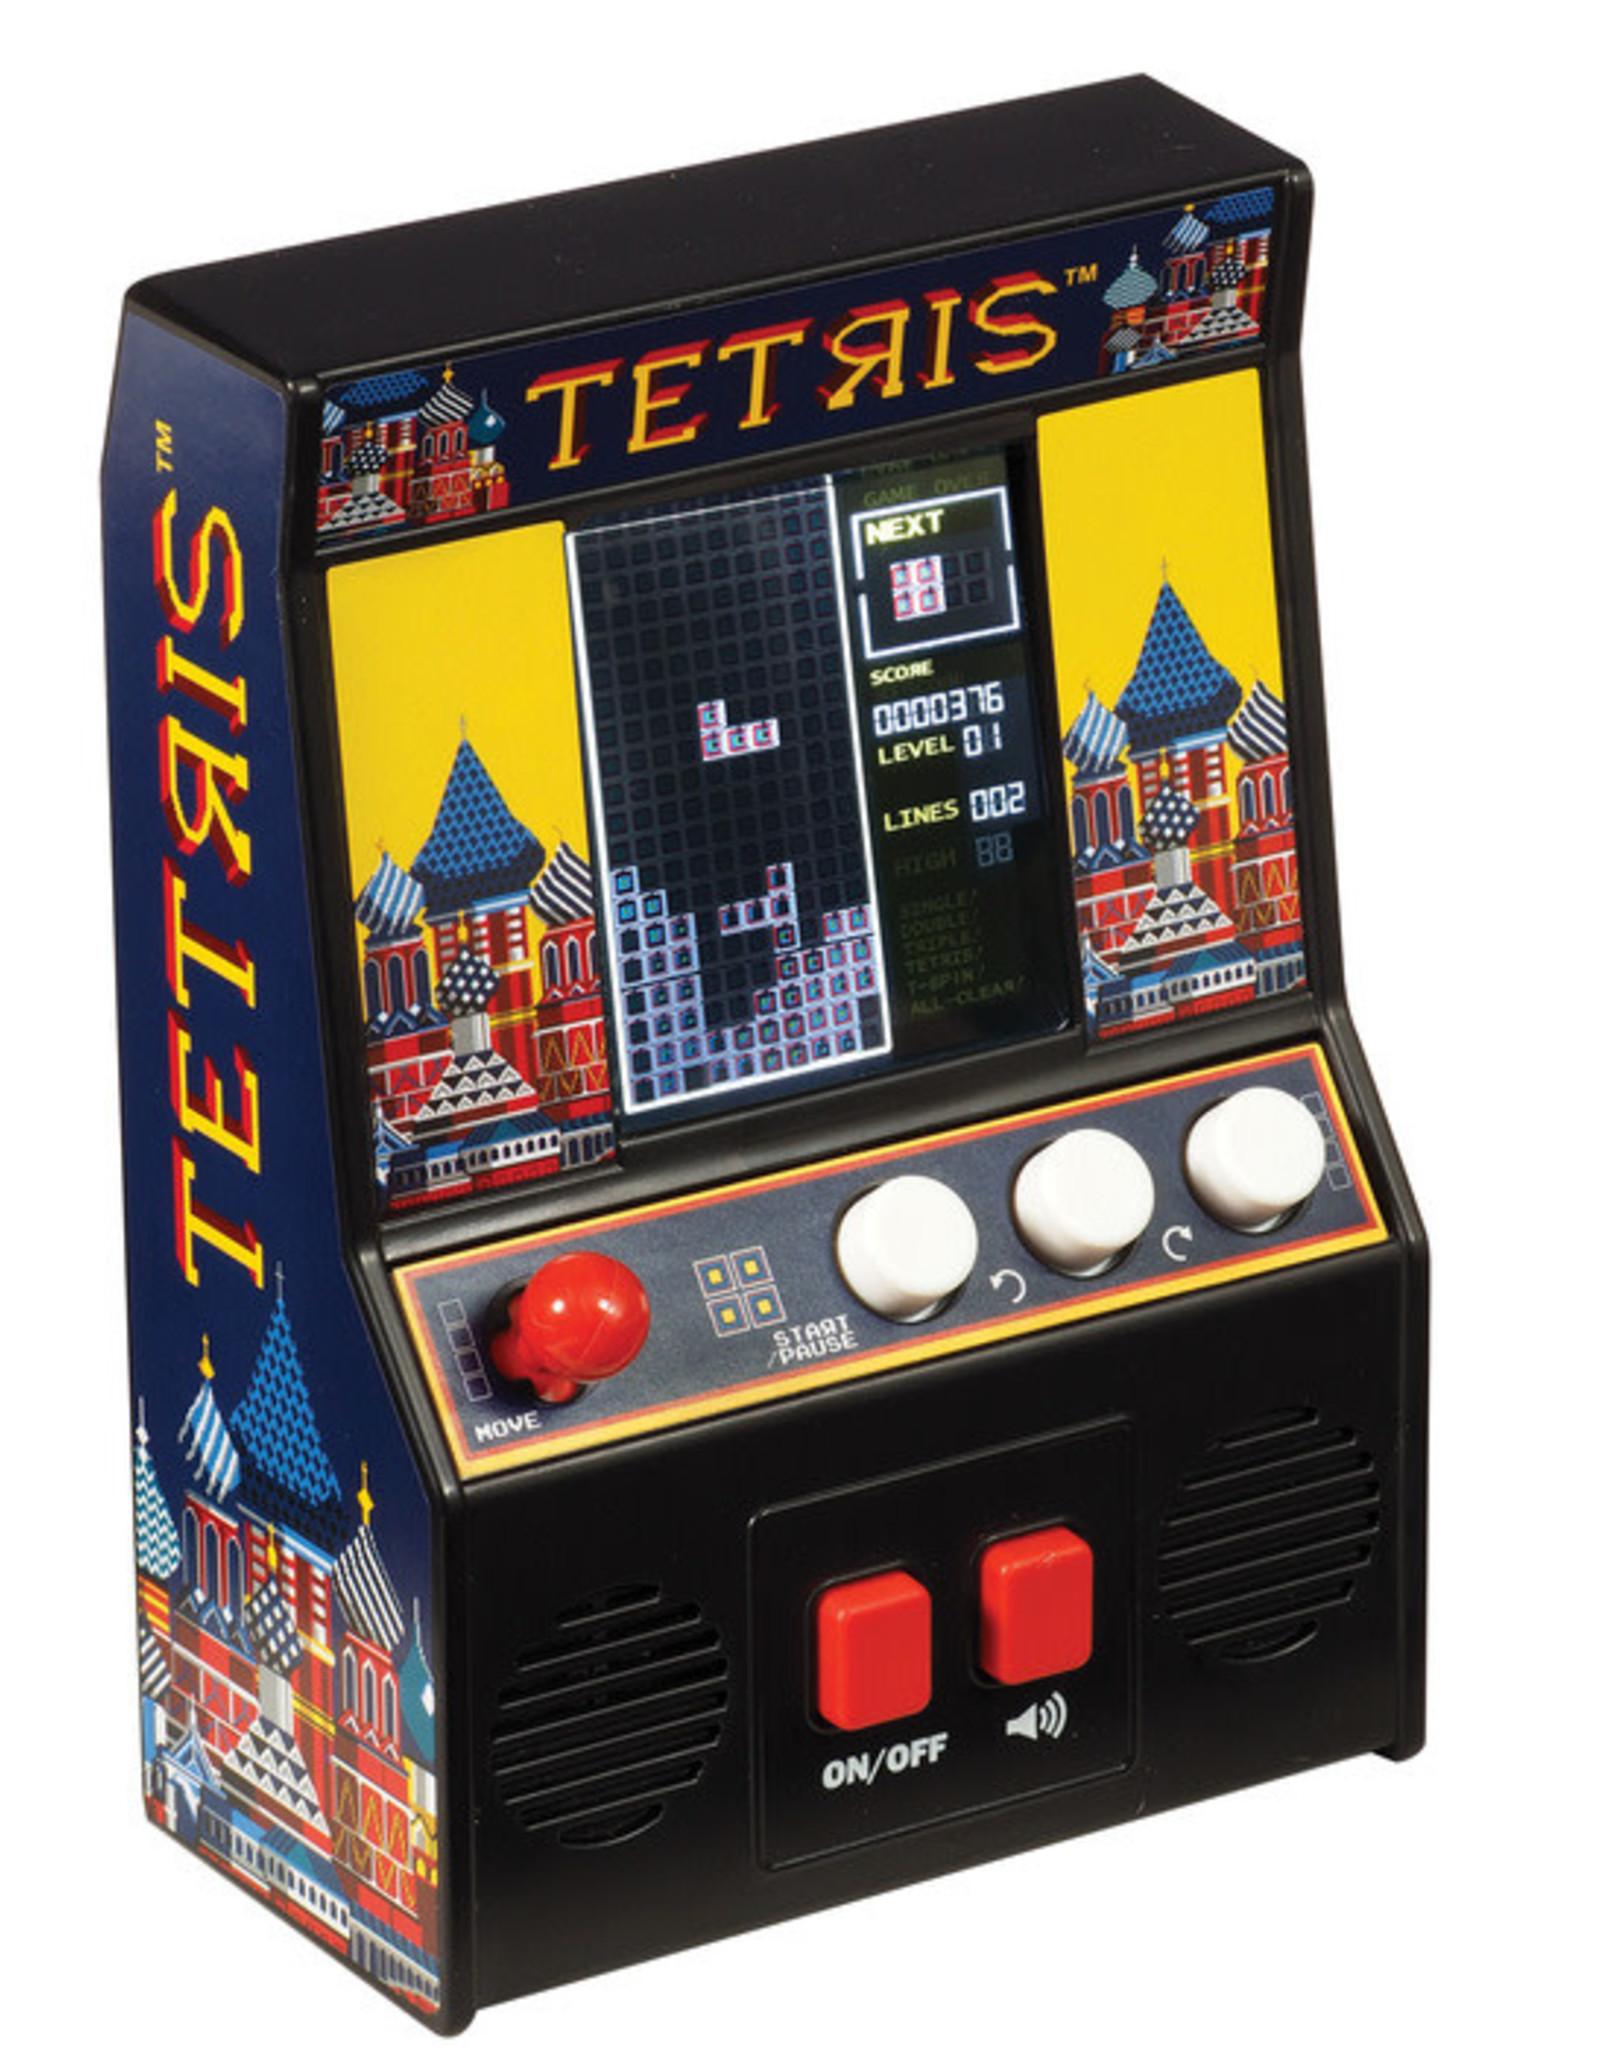 Schylling tetris mini arcade game